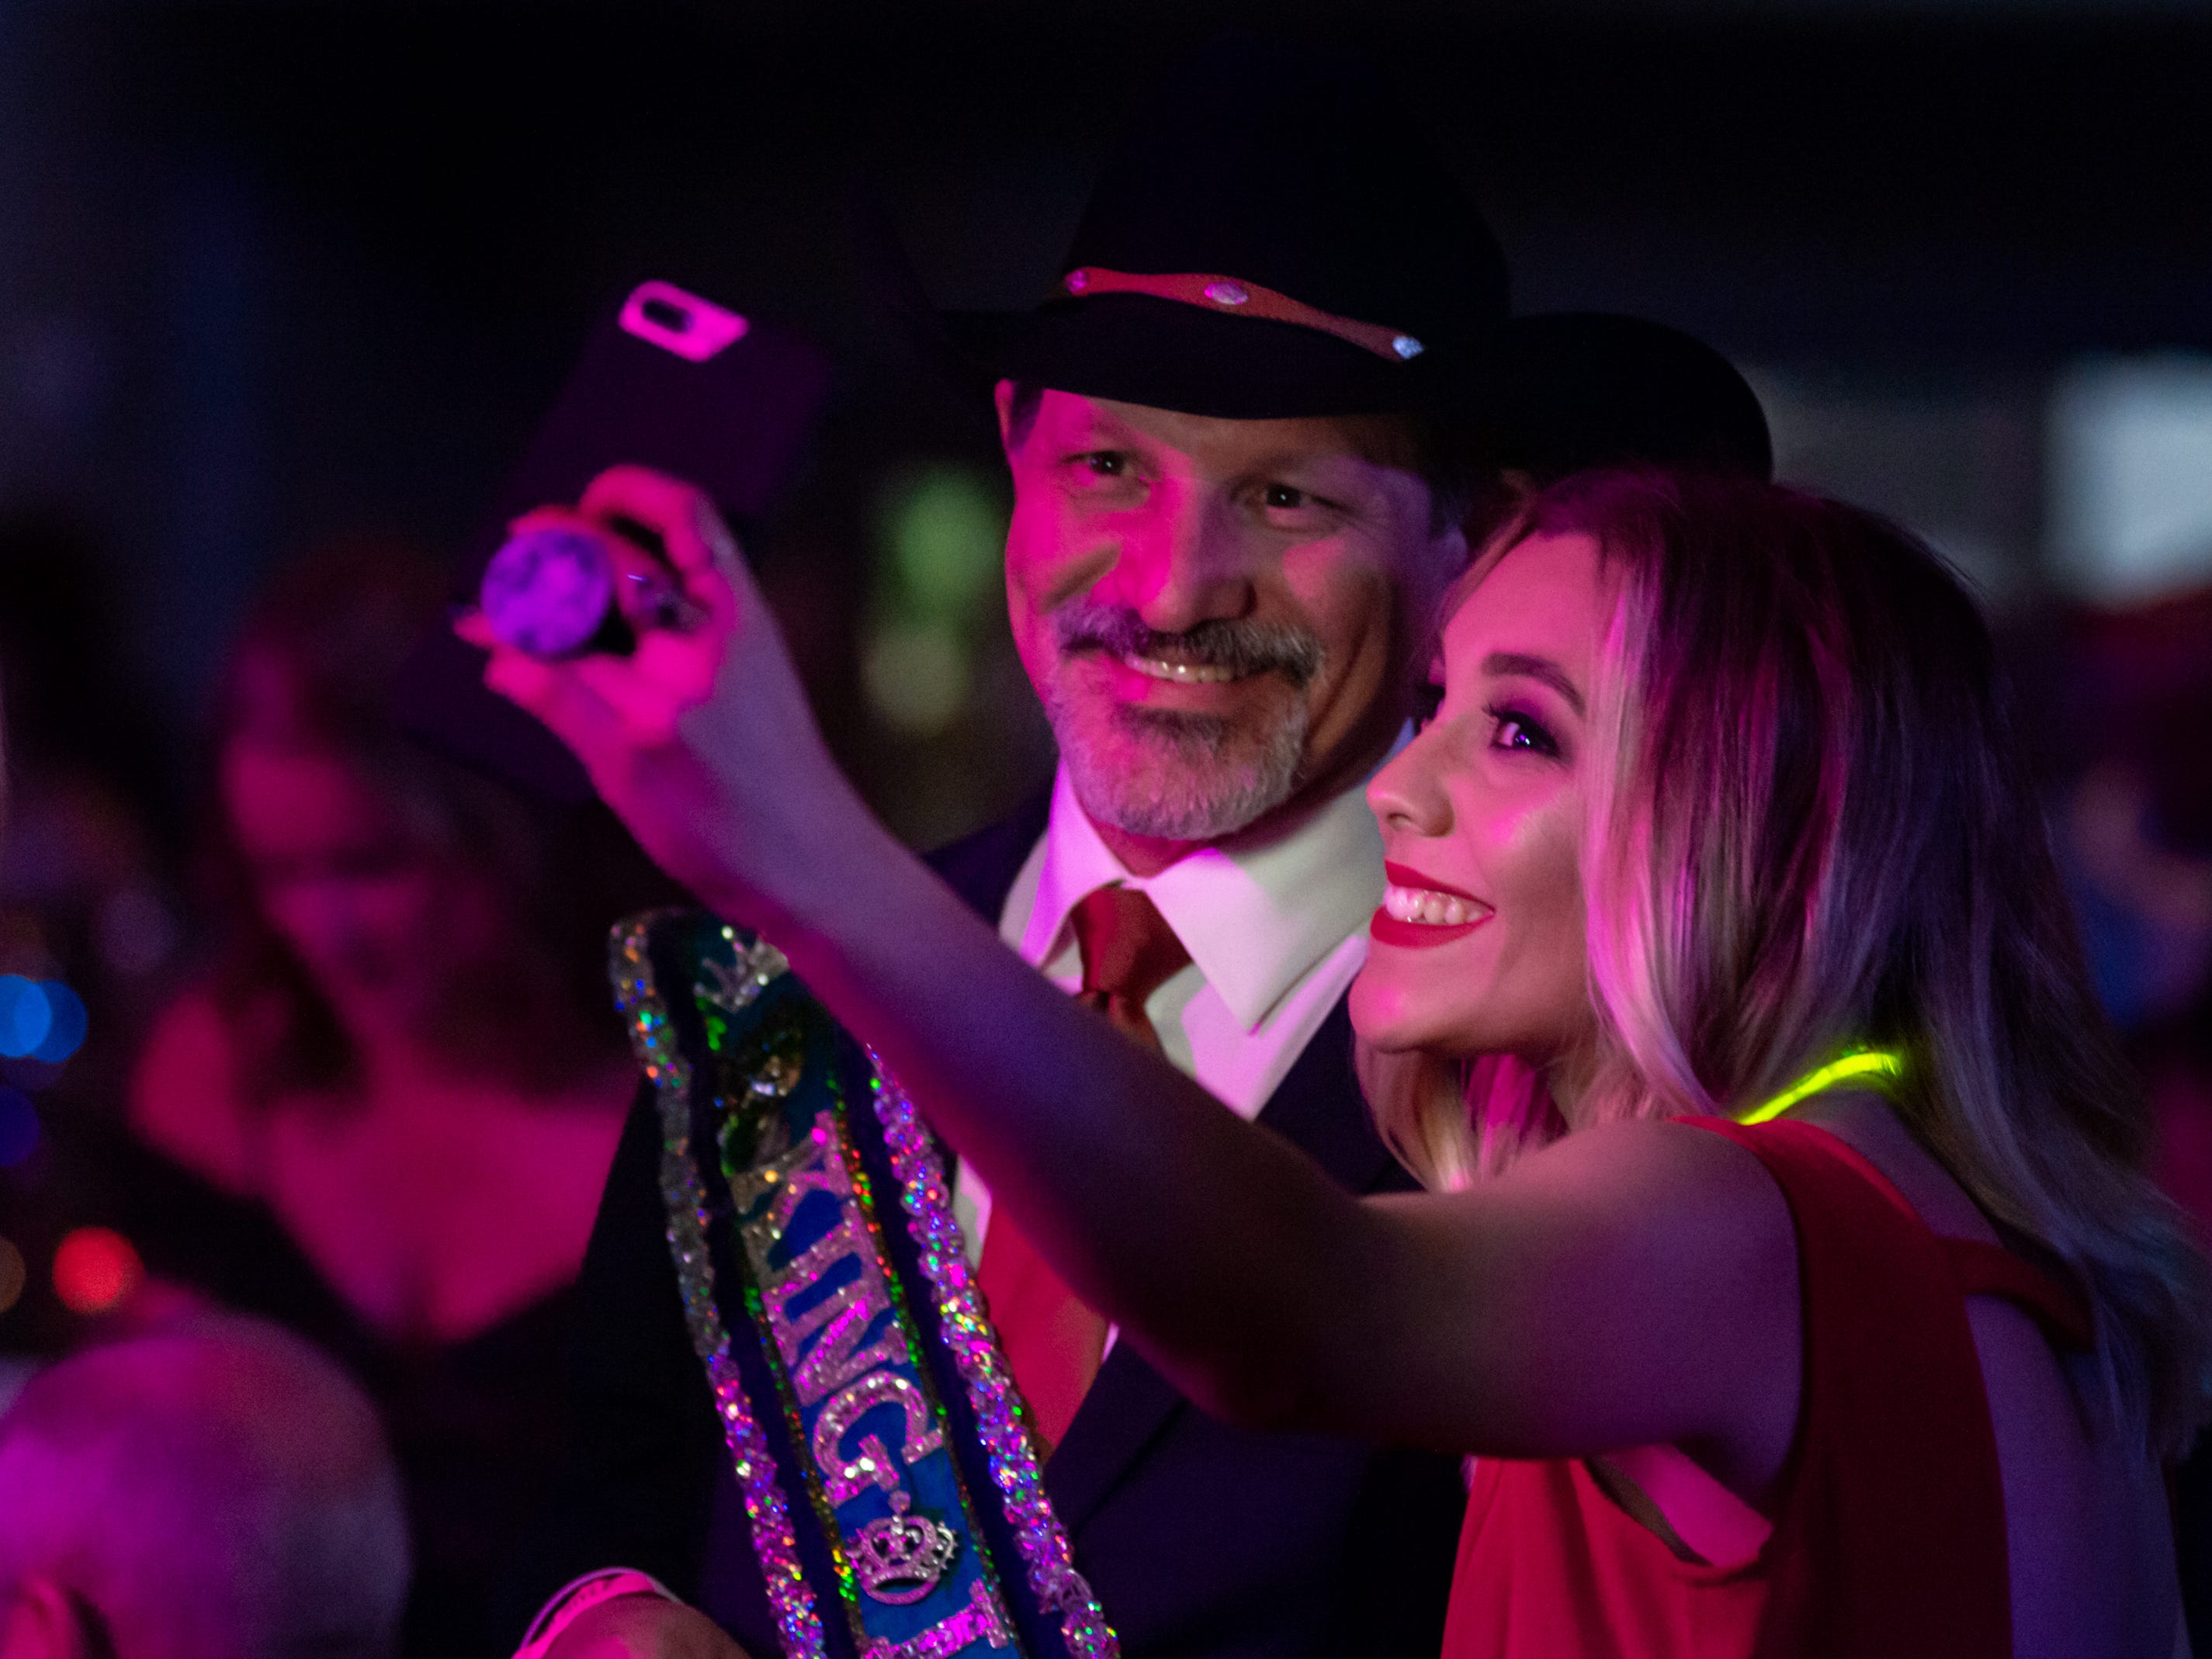 Krewe de Wideload Mardi Gras Ball at the Cajundome Convention Center. Friday, Feb. 1, 2019.